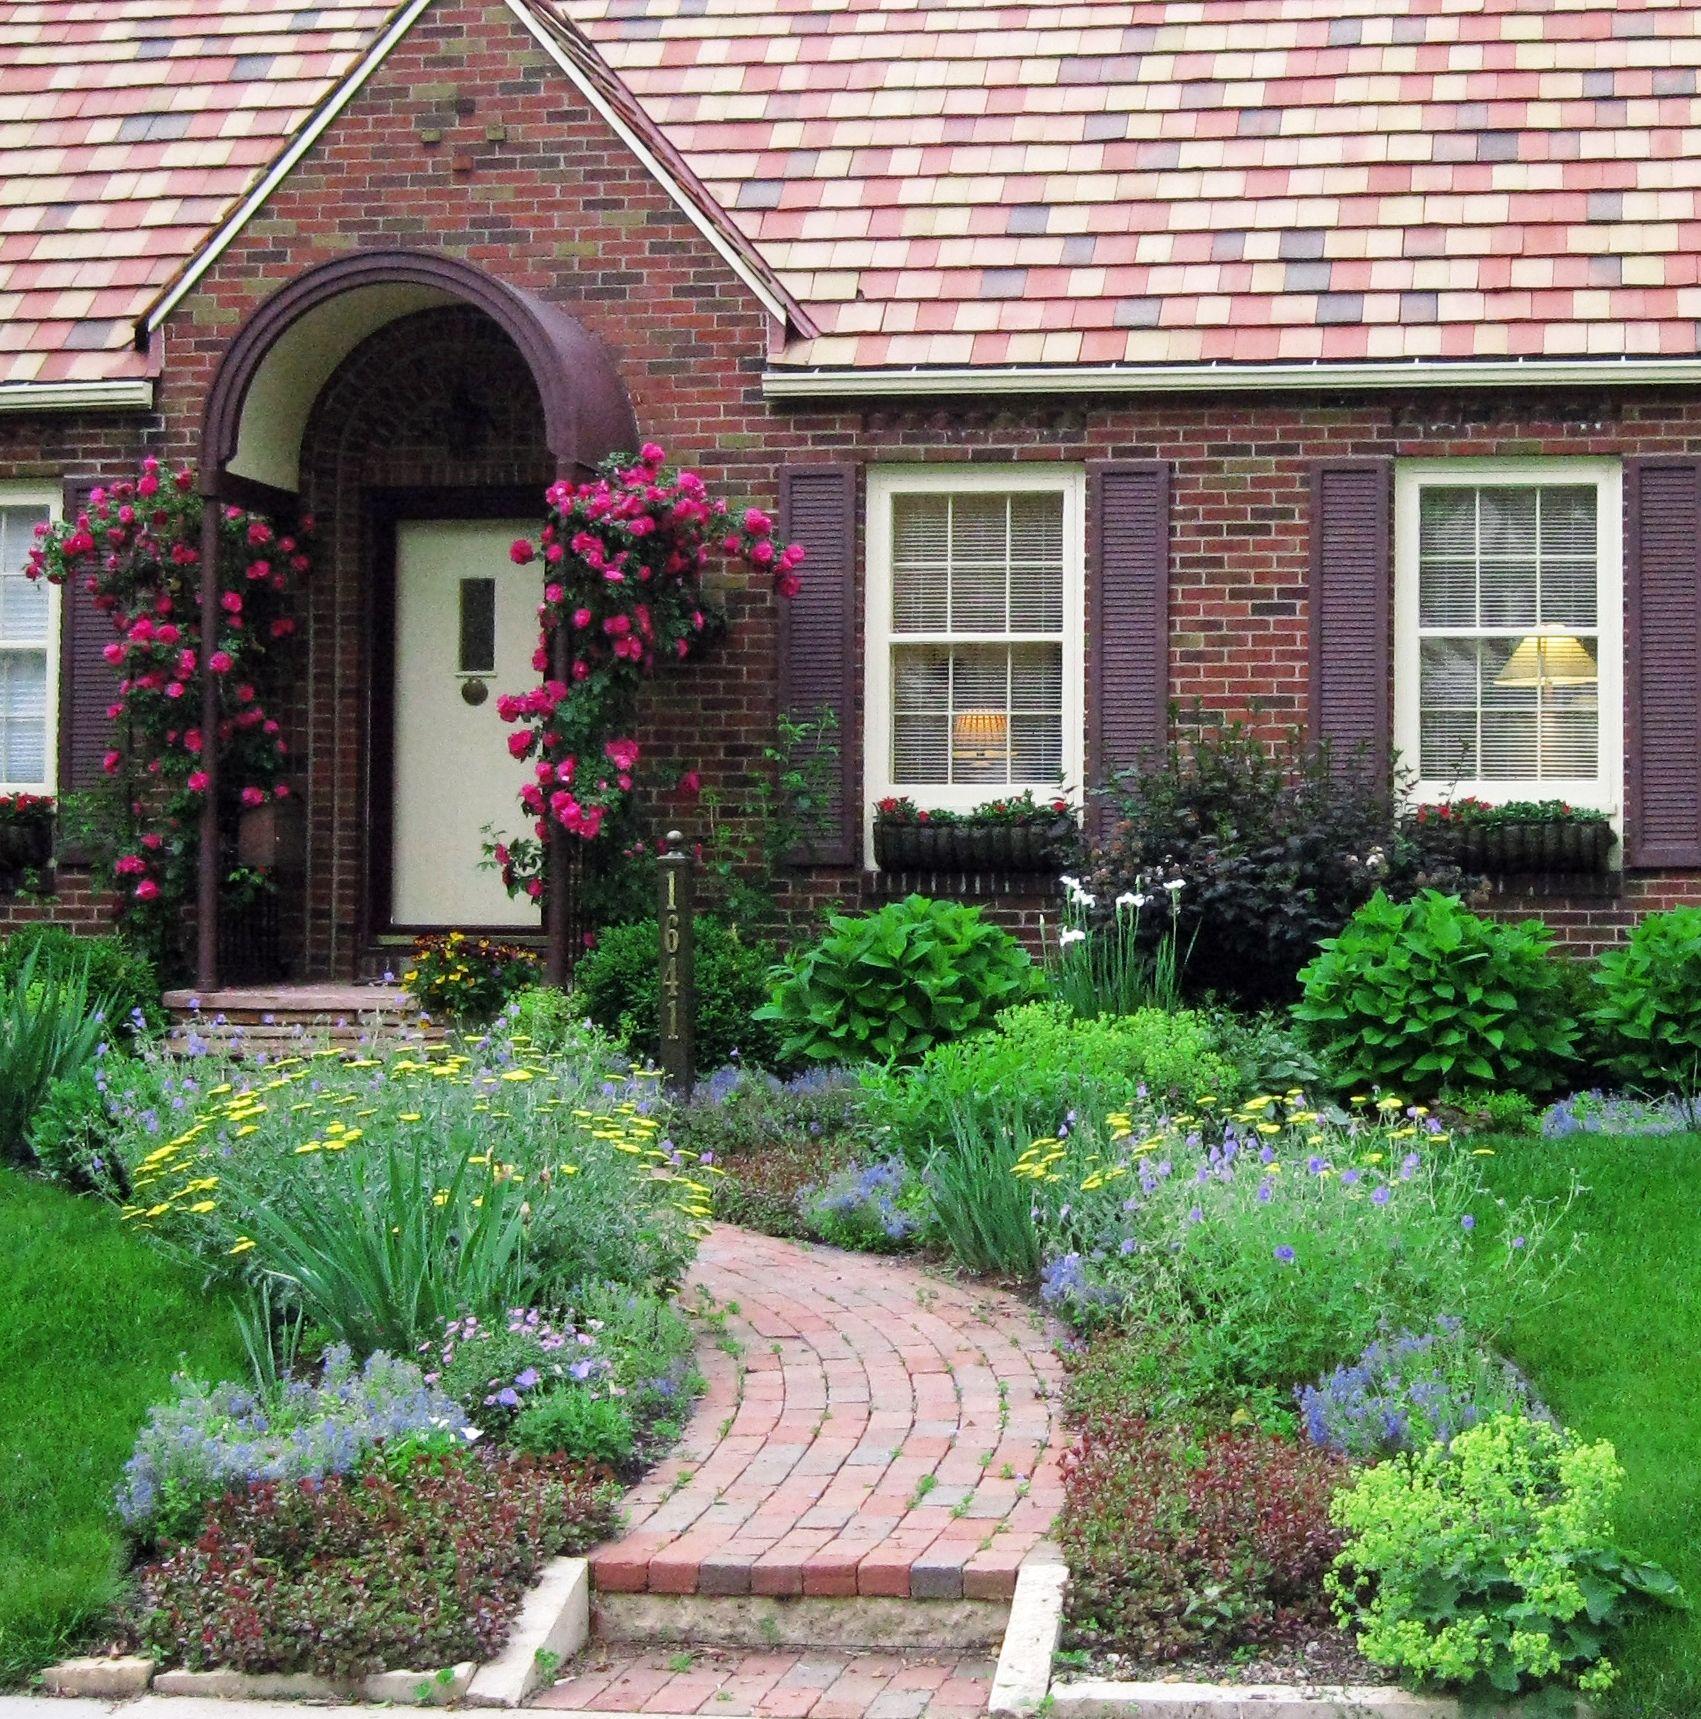 Front Yard Cottage Garden John Cabot Climbing Roses   Lori ... on Cottage Yard Ideas id=63984